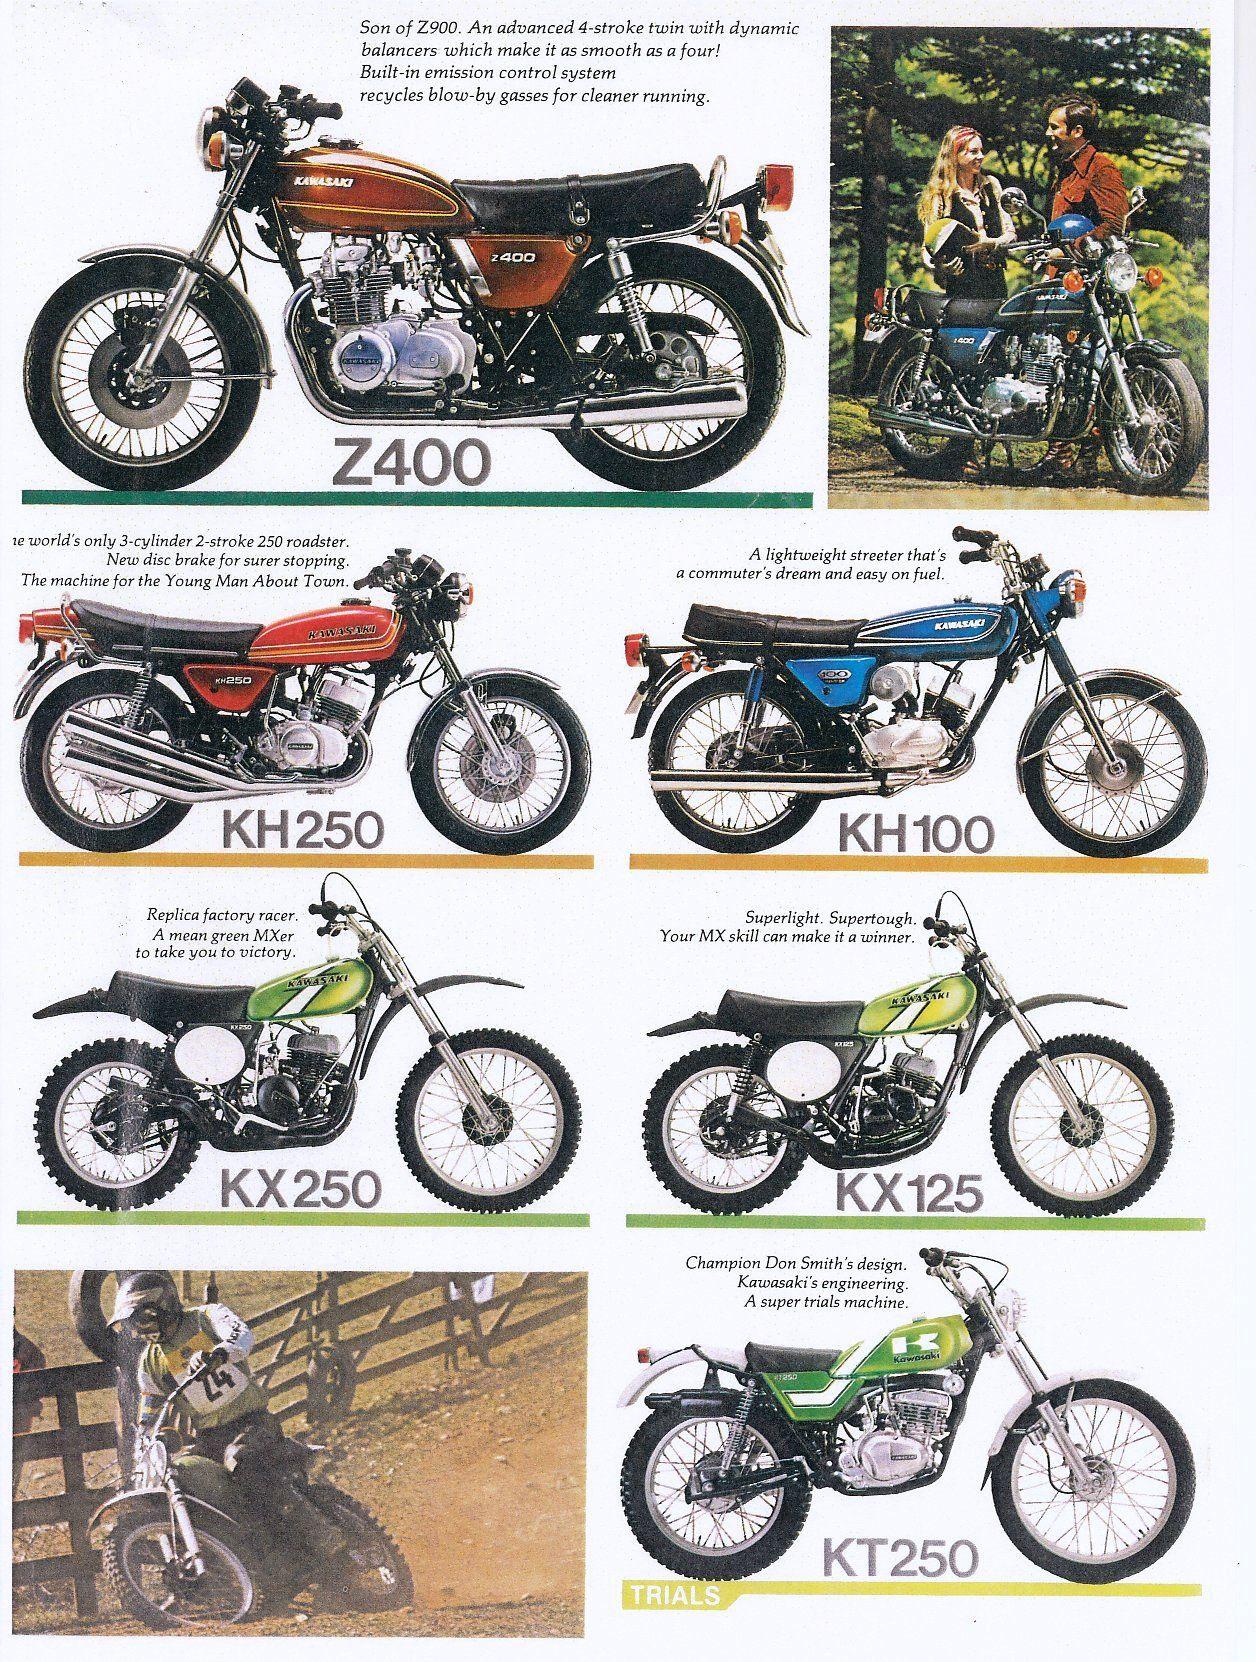 1976 Kawasaki Motorcycle Models Kz400 Kh250 Kh100 Kx125 Kx250